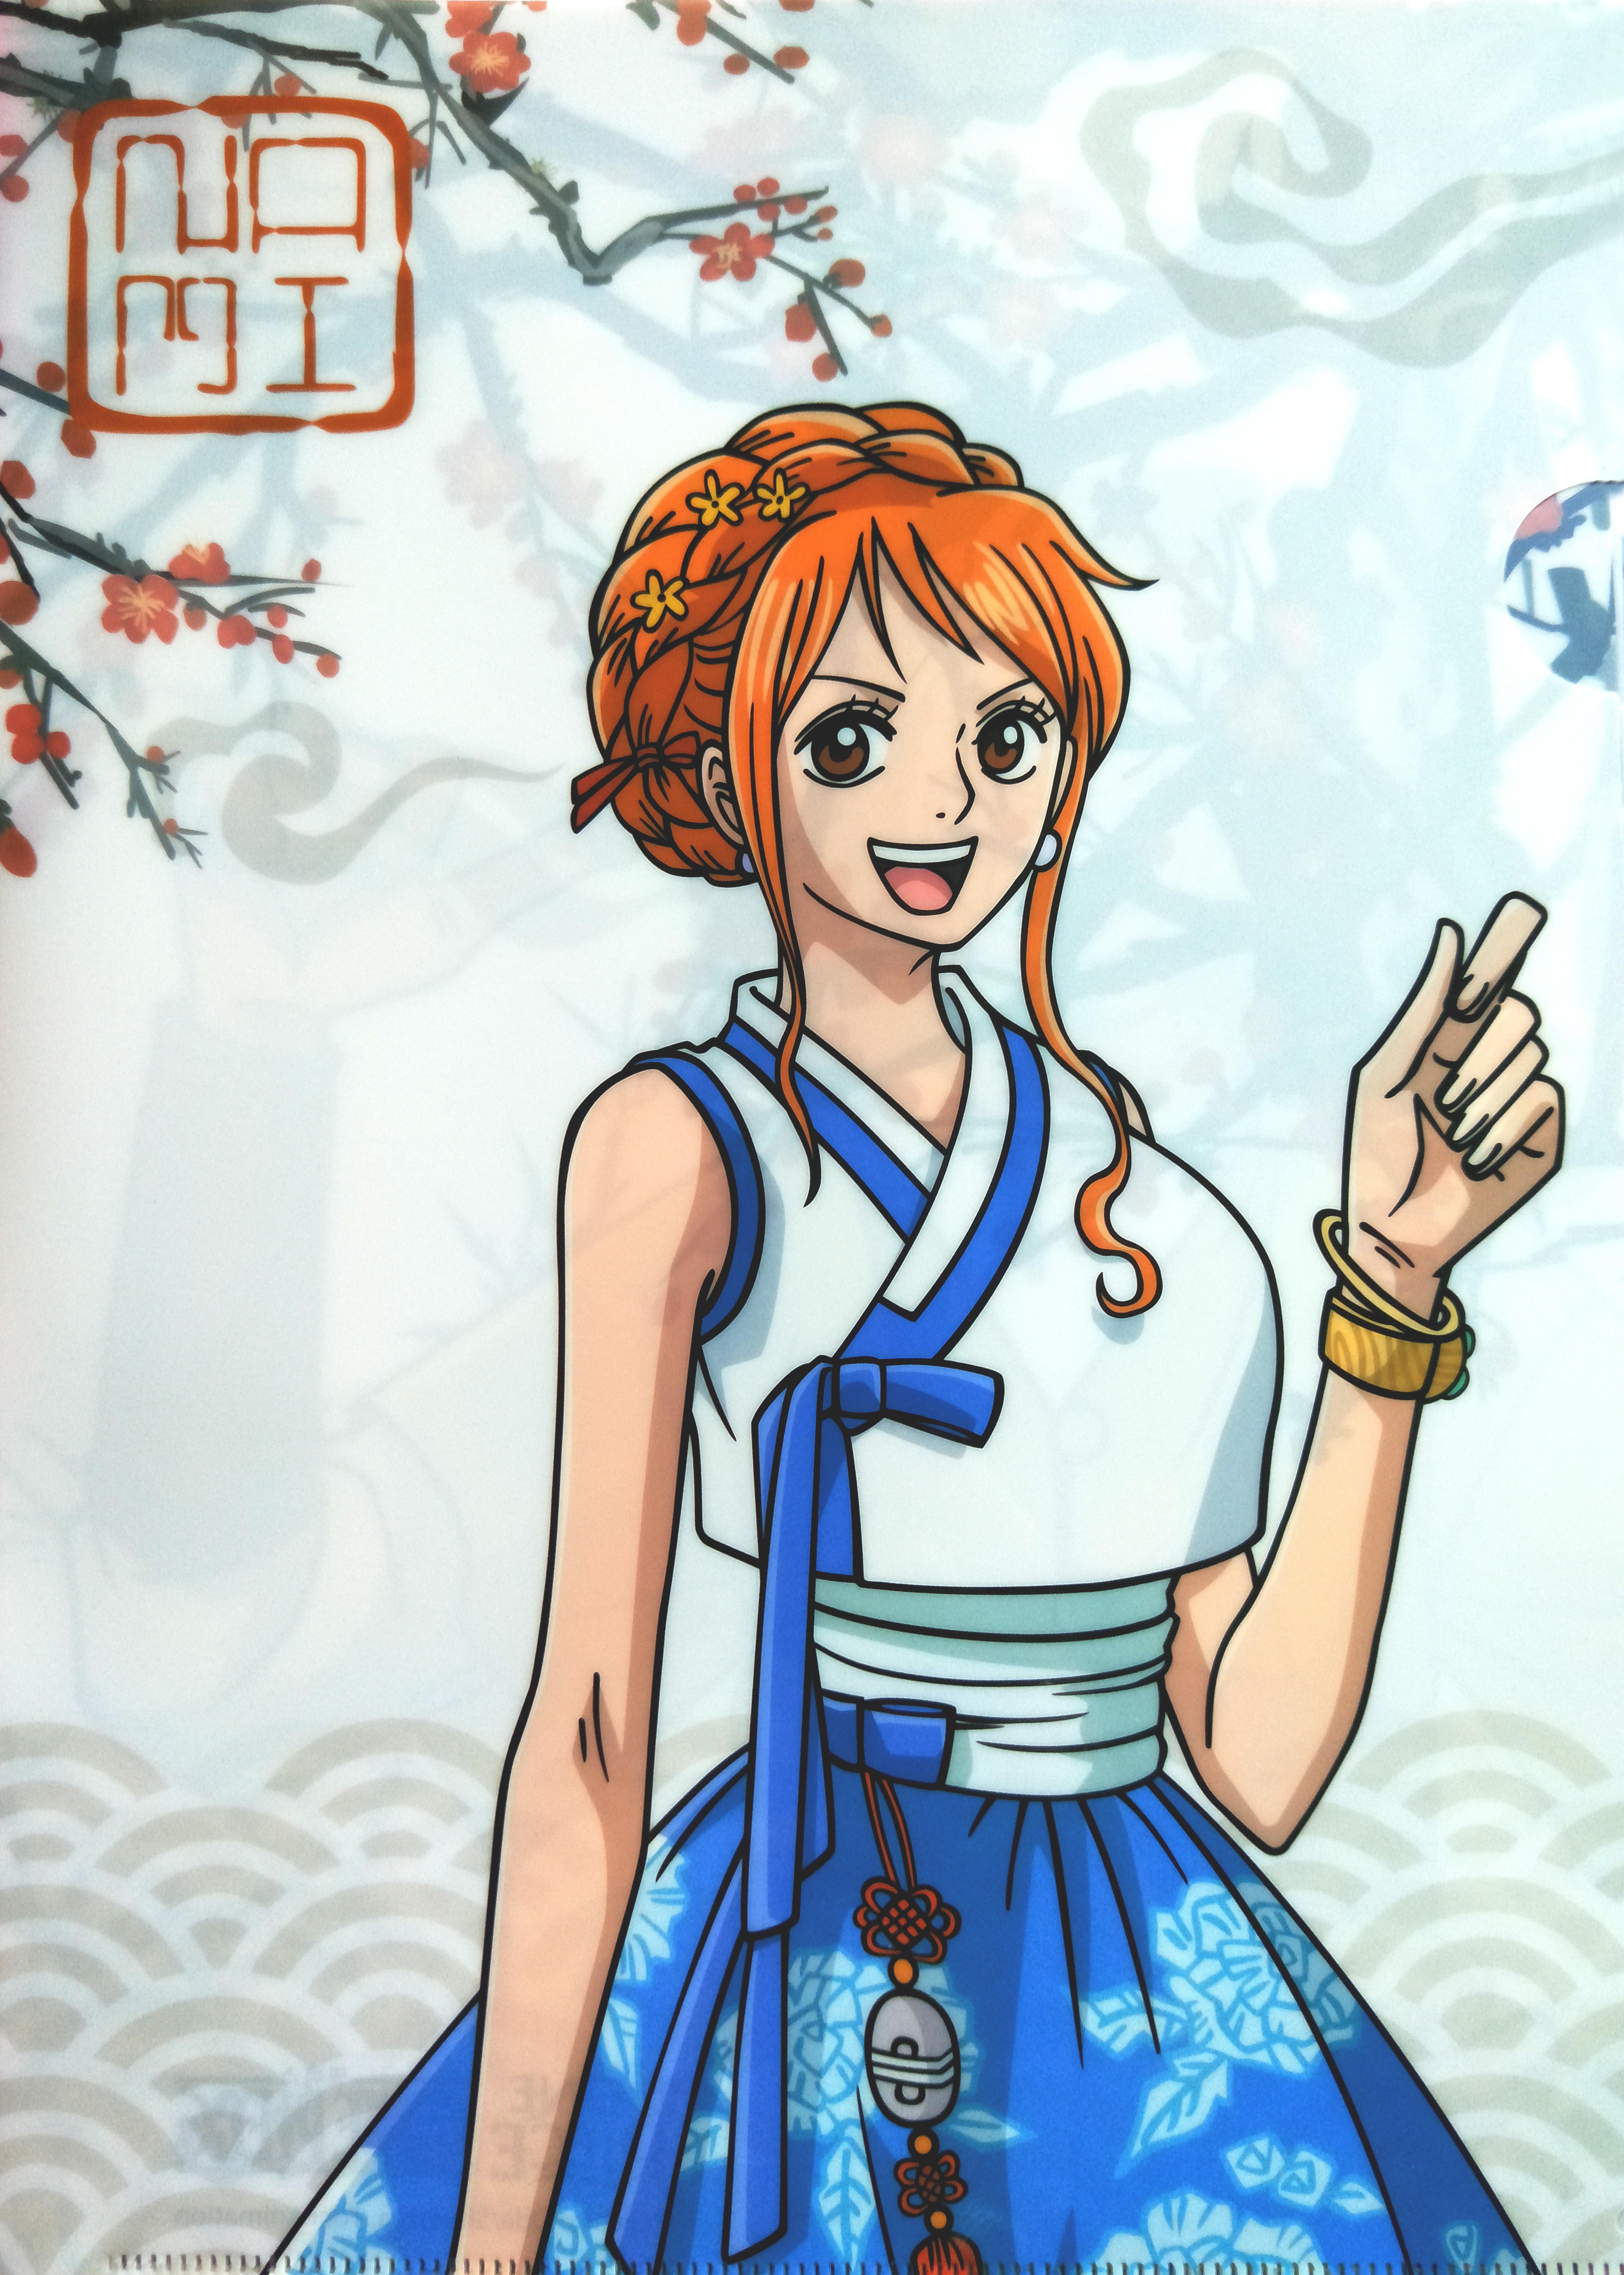 Nami (ONE PIECE) | page 6 of 63 - Zerochan Anime Image Board